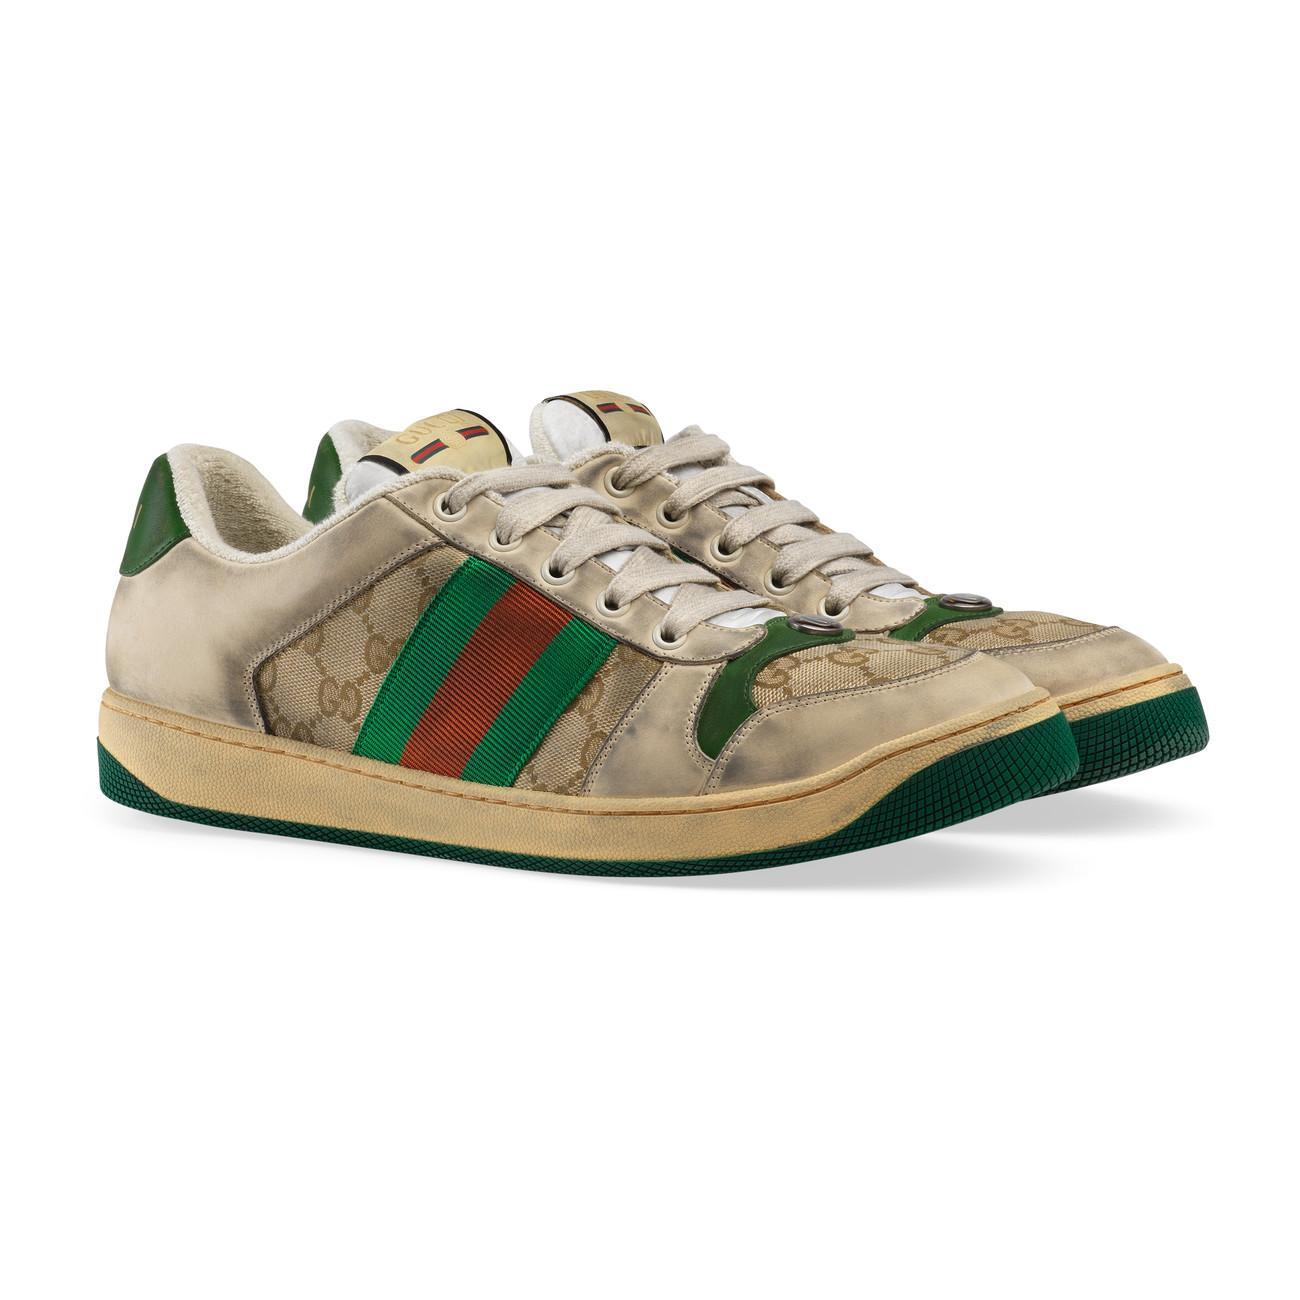 0d4985837e7 Gucci - Green Men s Screener GG Sneaker for Men - Lyst. View fullscreen